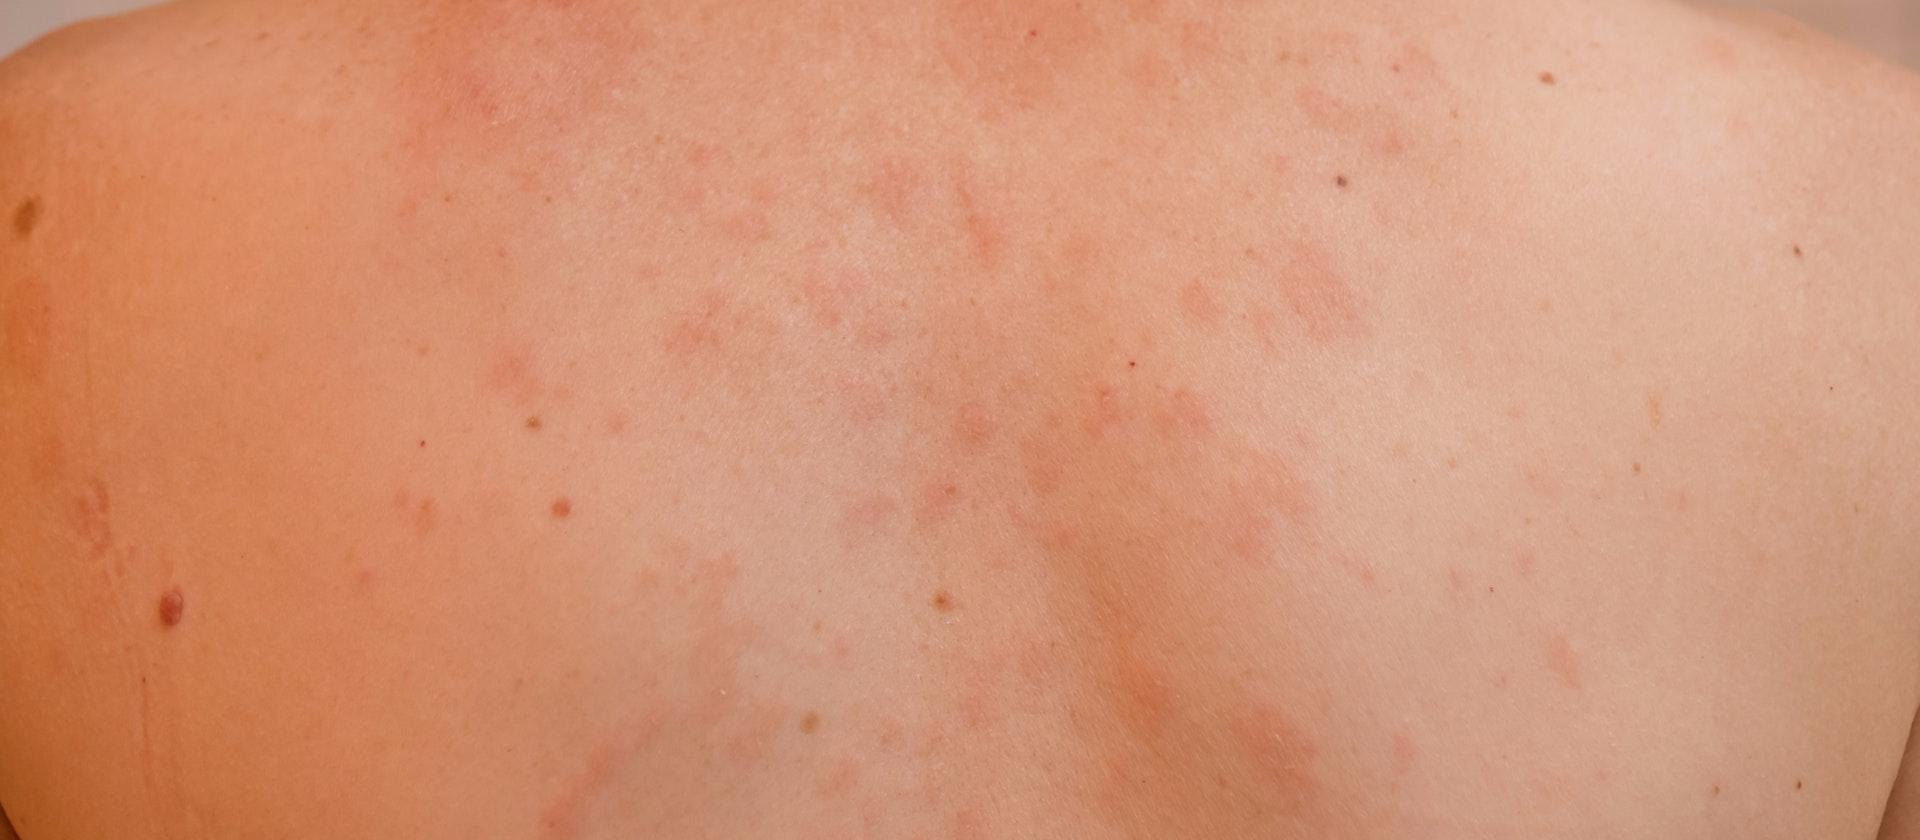 skin-rash-on-penis-charlotte-cheung-nude